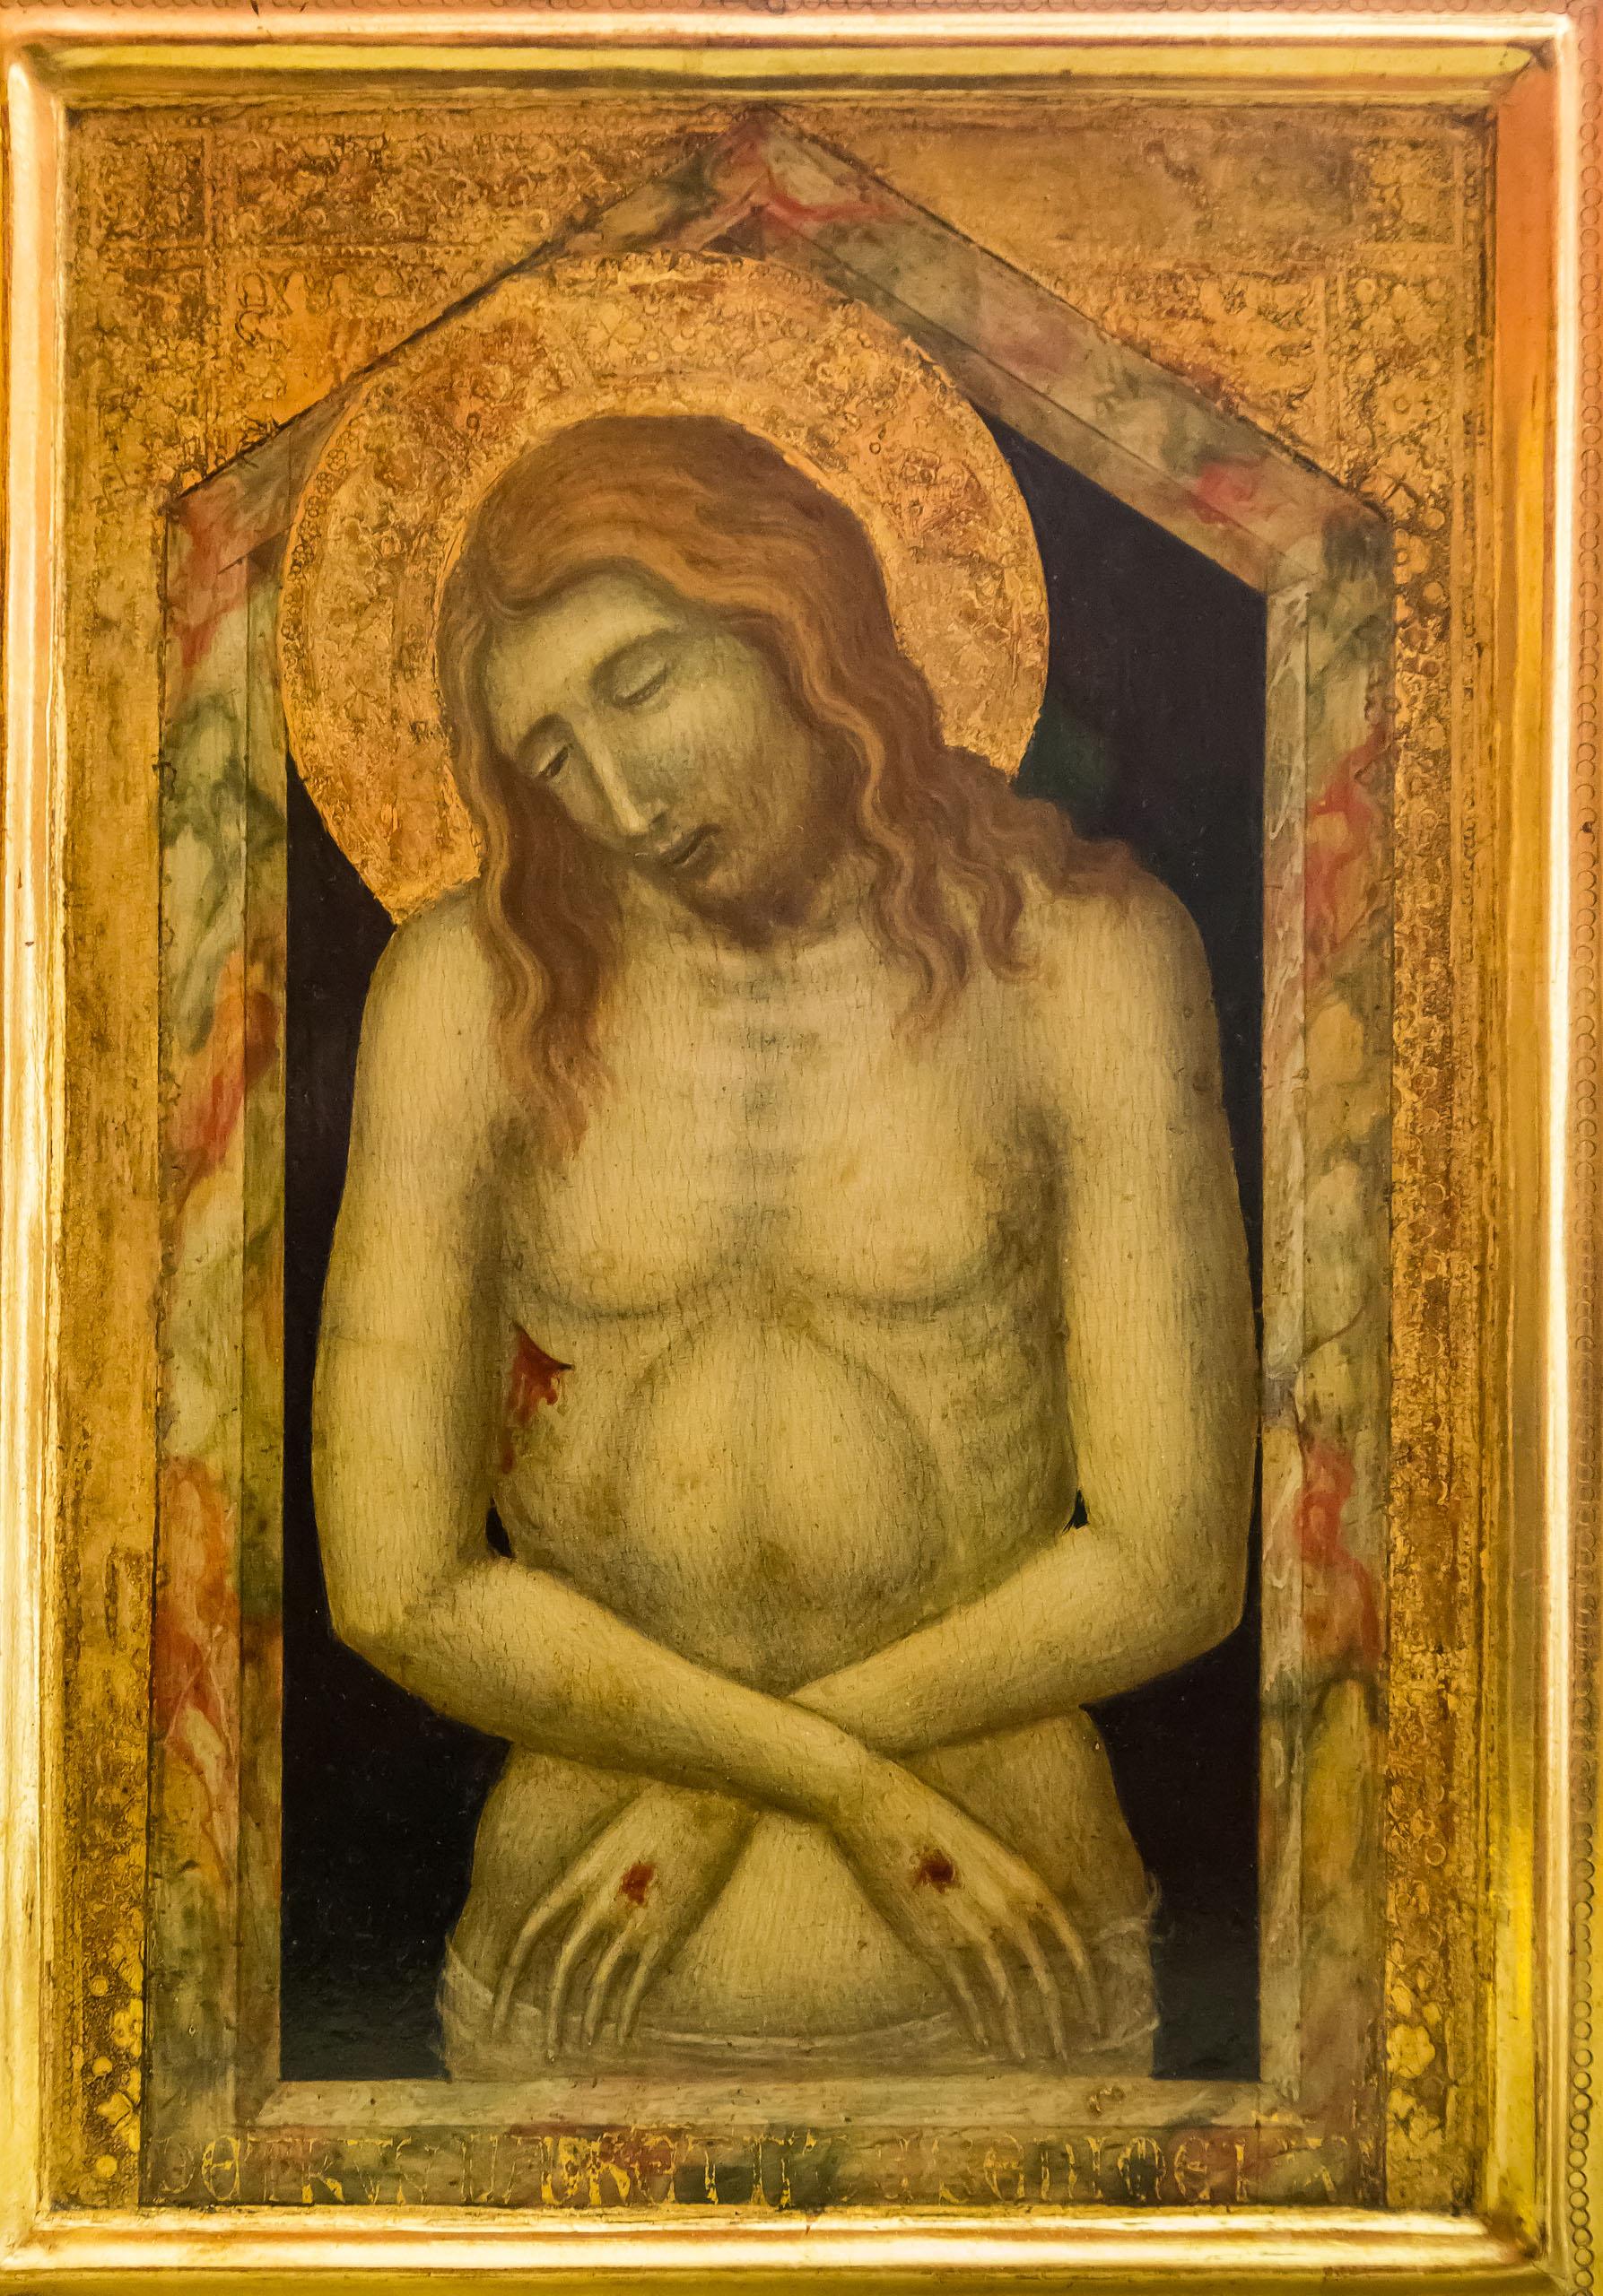 1340-45 Lorenzetti Pietro Ecce homo Lindenau Museum Altenburg